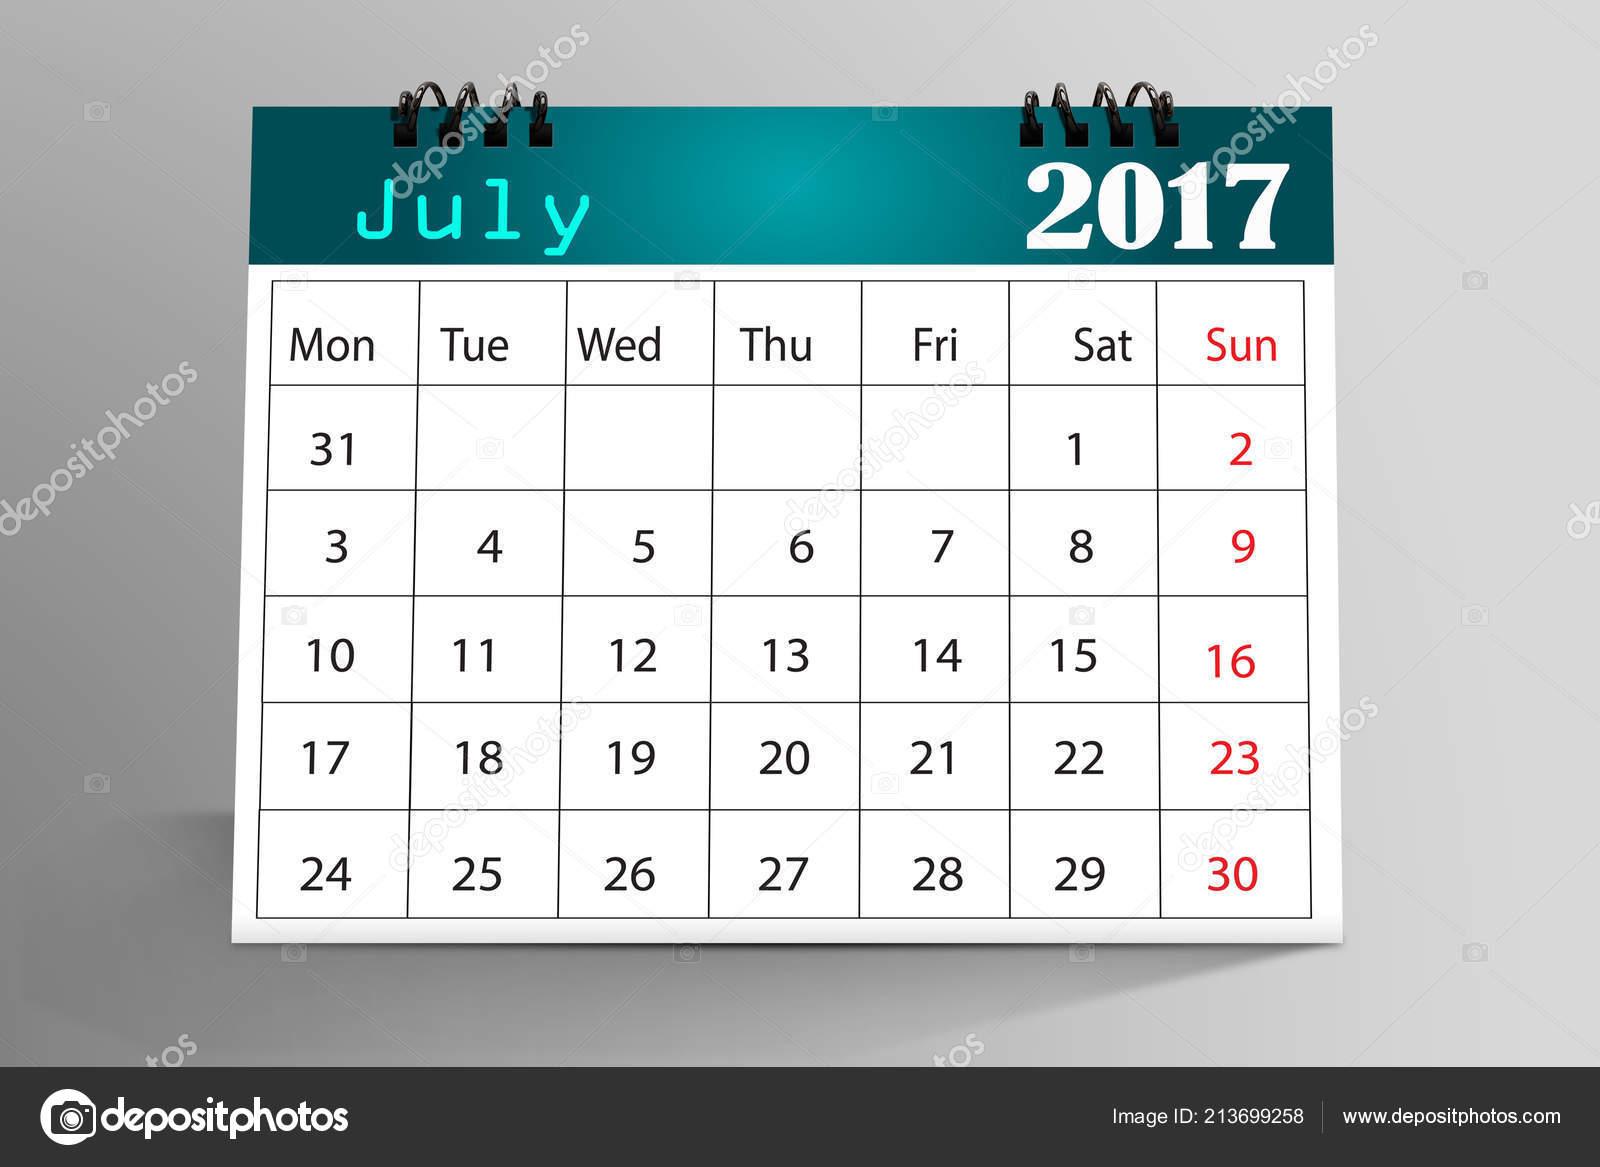 July 2017 Desktop Calendar Isolated Gray Background — Stock